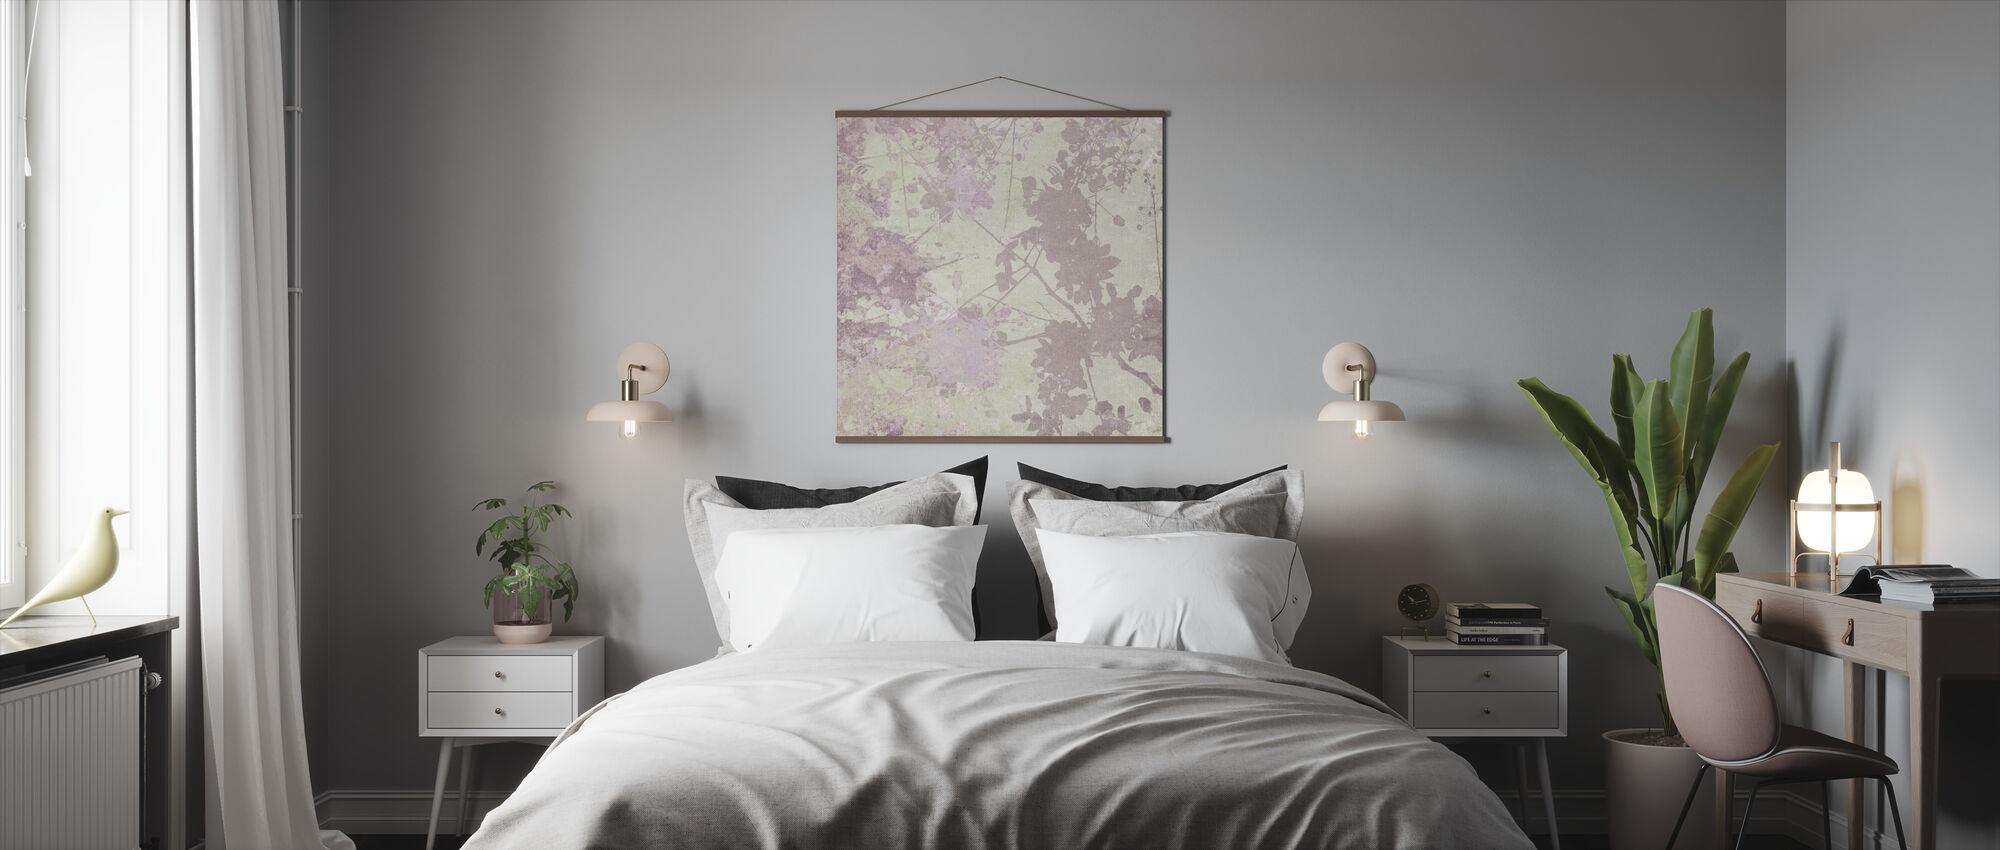 Good Night Sweetheart - Poster - Bedroom